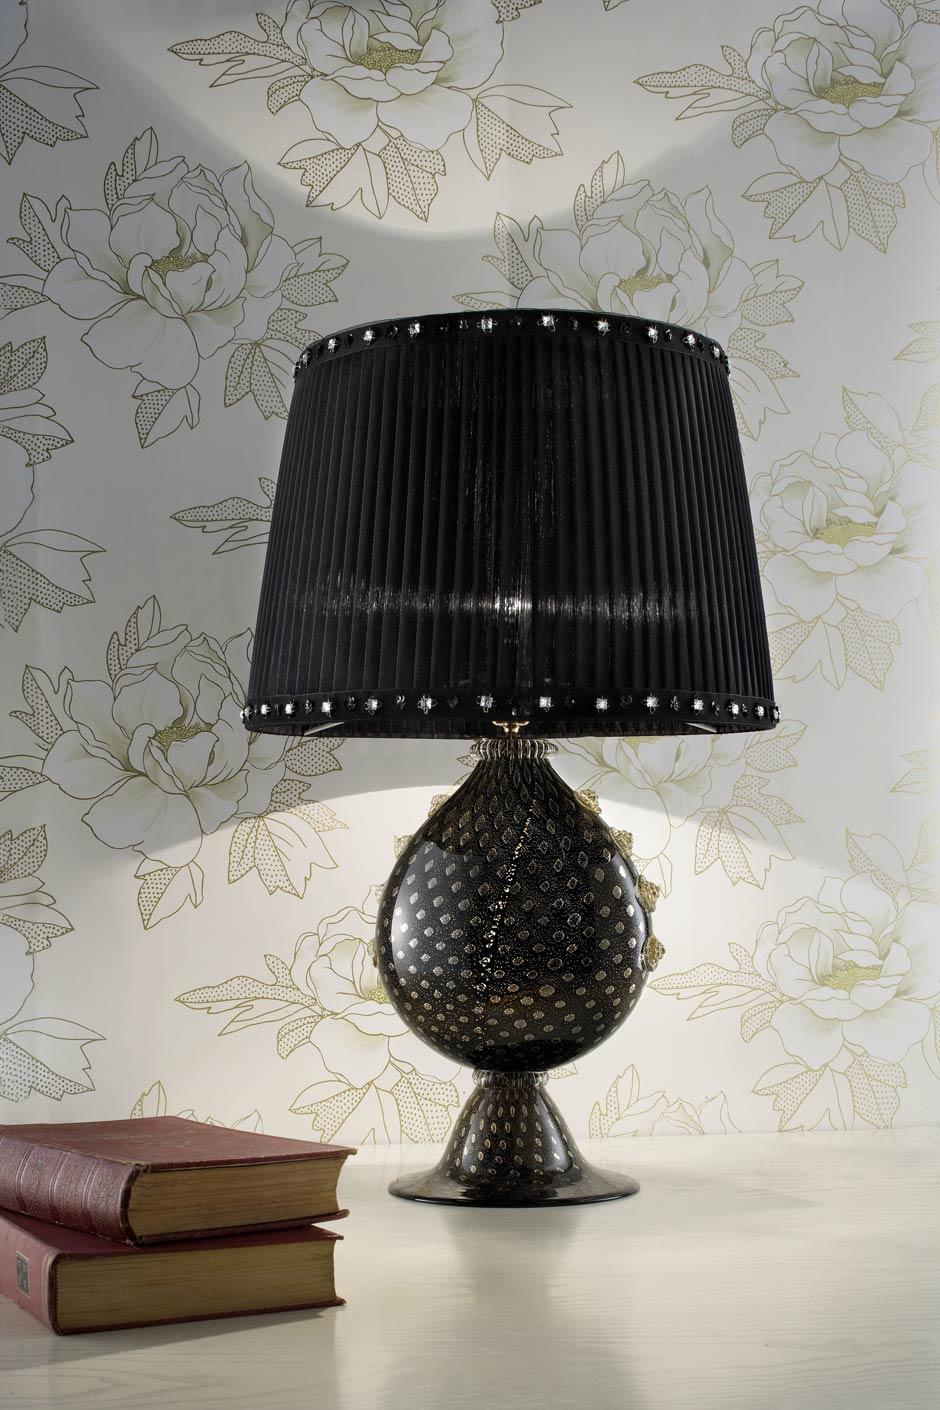 Black murano table lamp with black silk organza shade masiero black murano table lamp with black silk organza shade masiero aloadofball Image collections